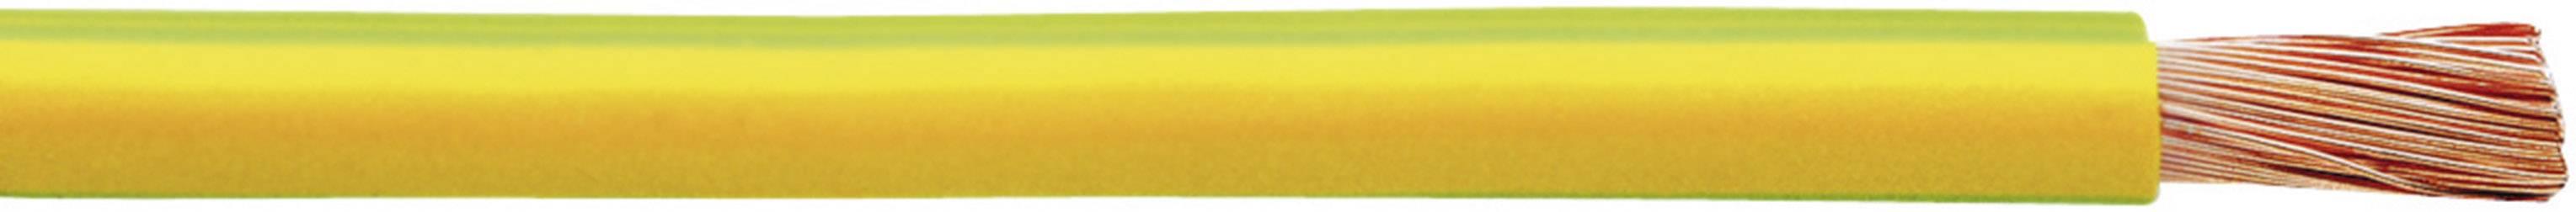 100m Litze PVC Aderleitung Flexibel 4mm² H07V-K Lapp Kabel Farbwahl